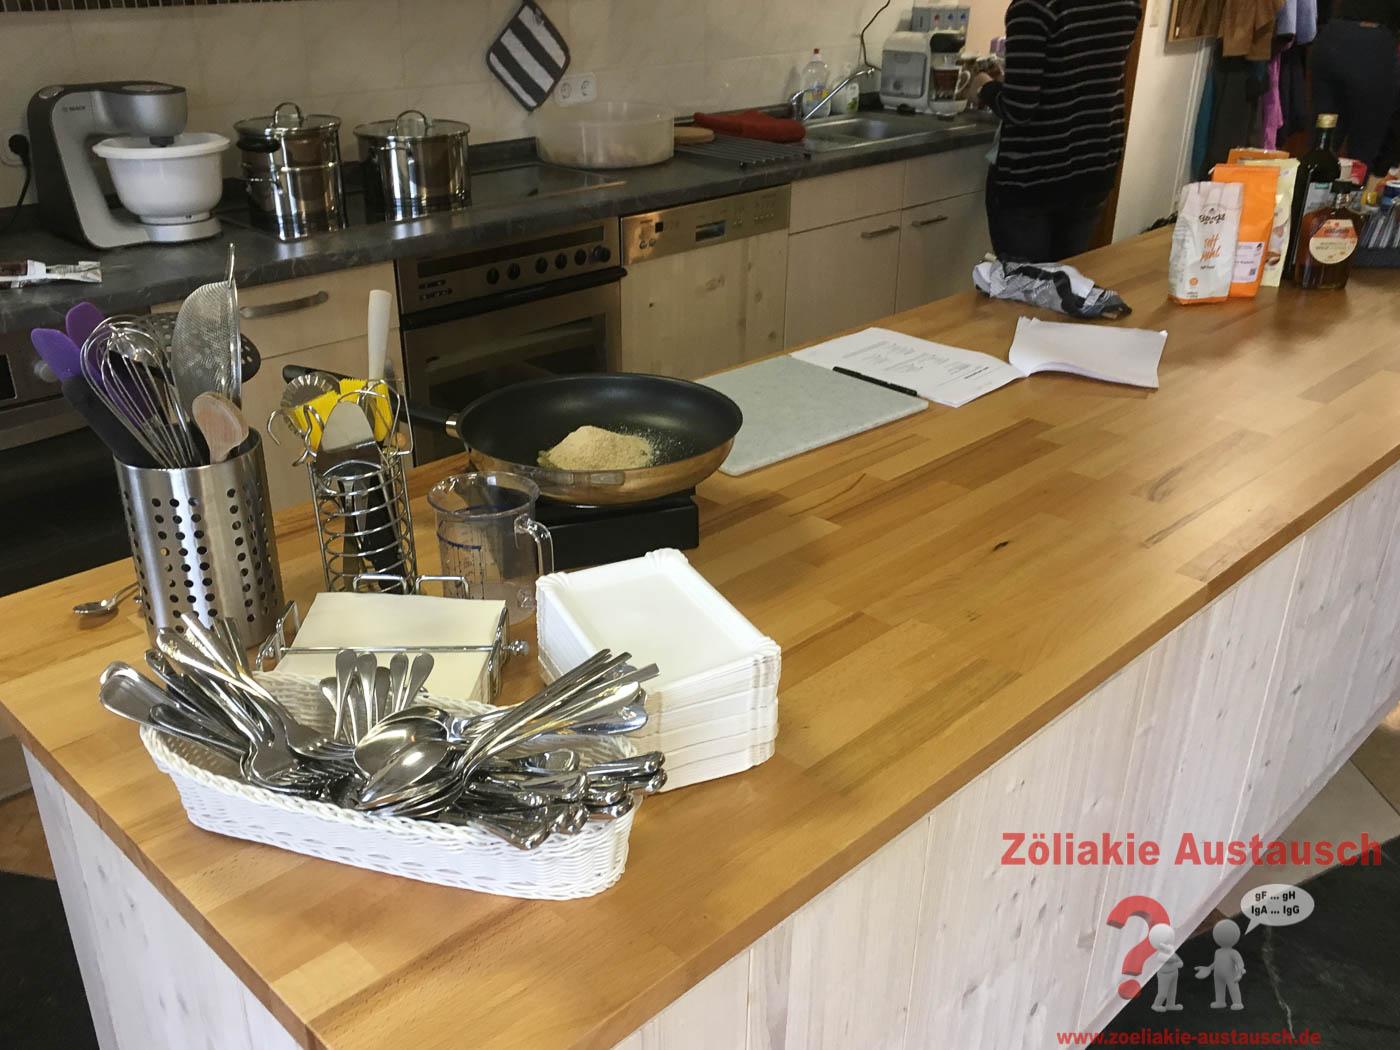 Zoeliakie_Austausch_Tanja_Gruber-Backkurs_2017-003